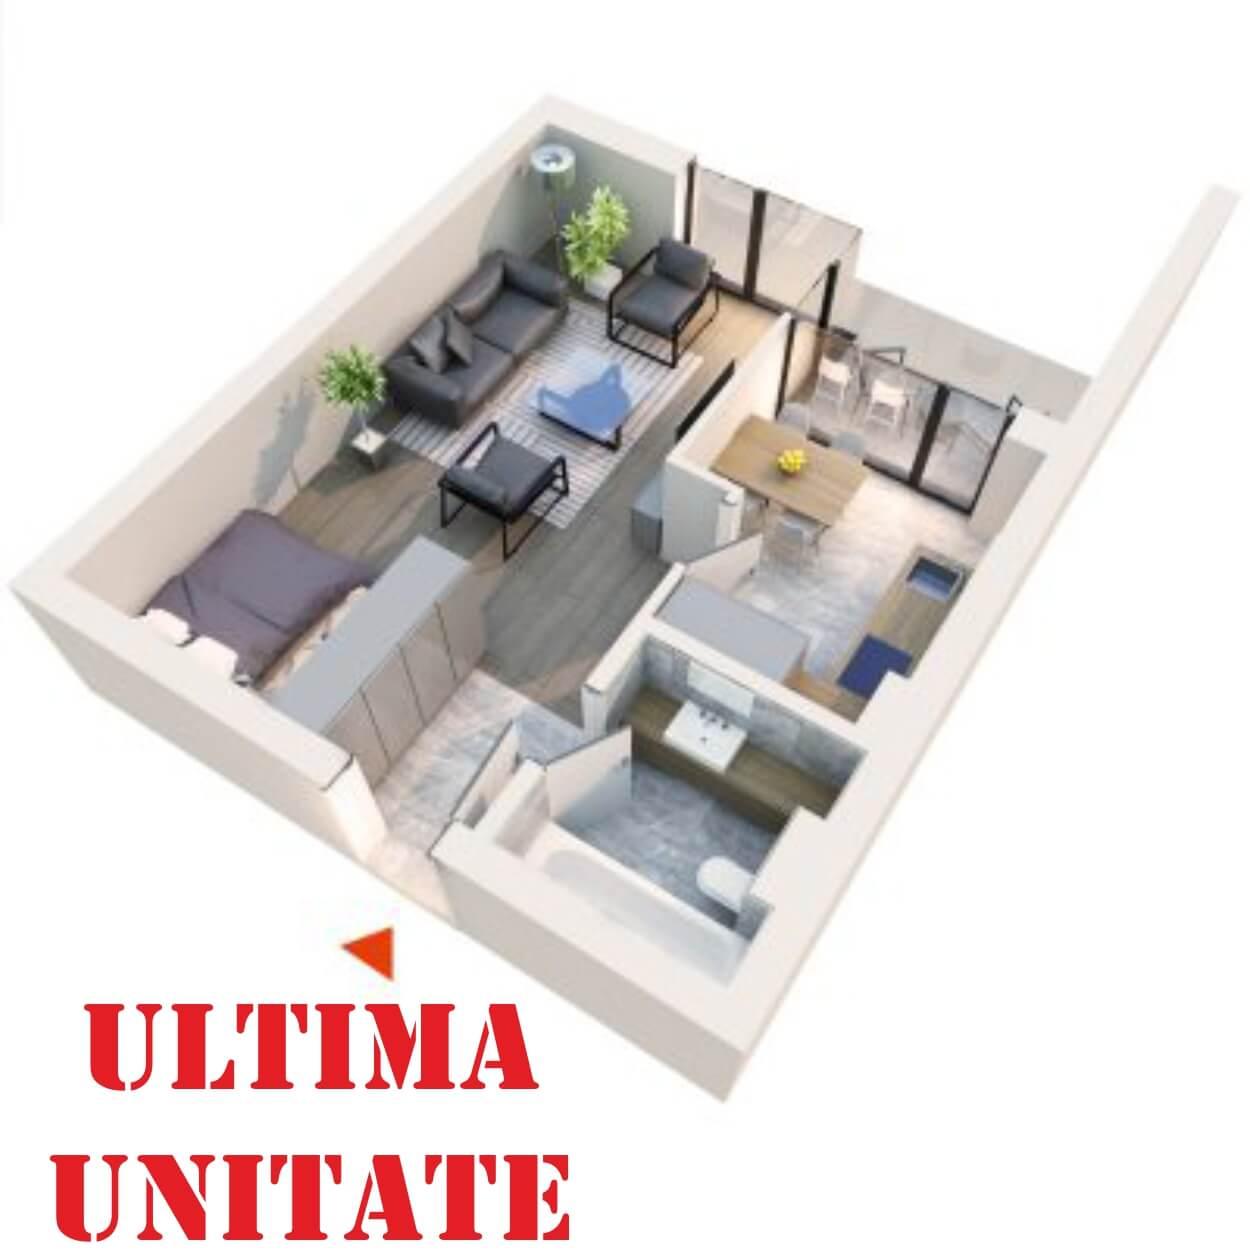 Apartament Studio tip 1E1′ | Balcon | Etaj 6 | Corp C7 C8 | Faza 2